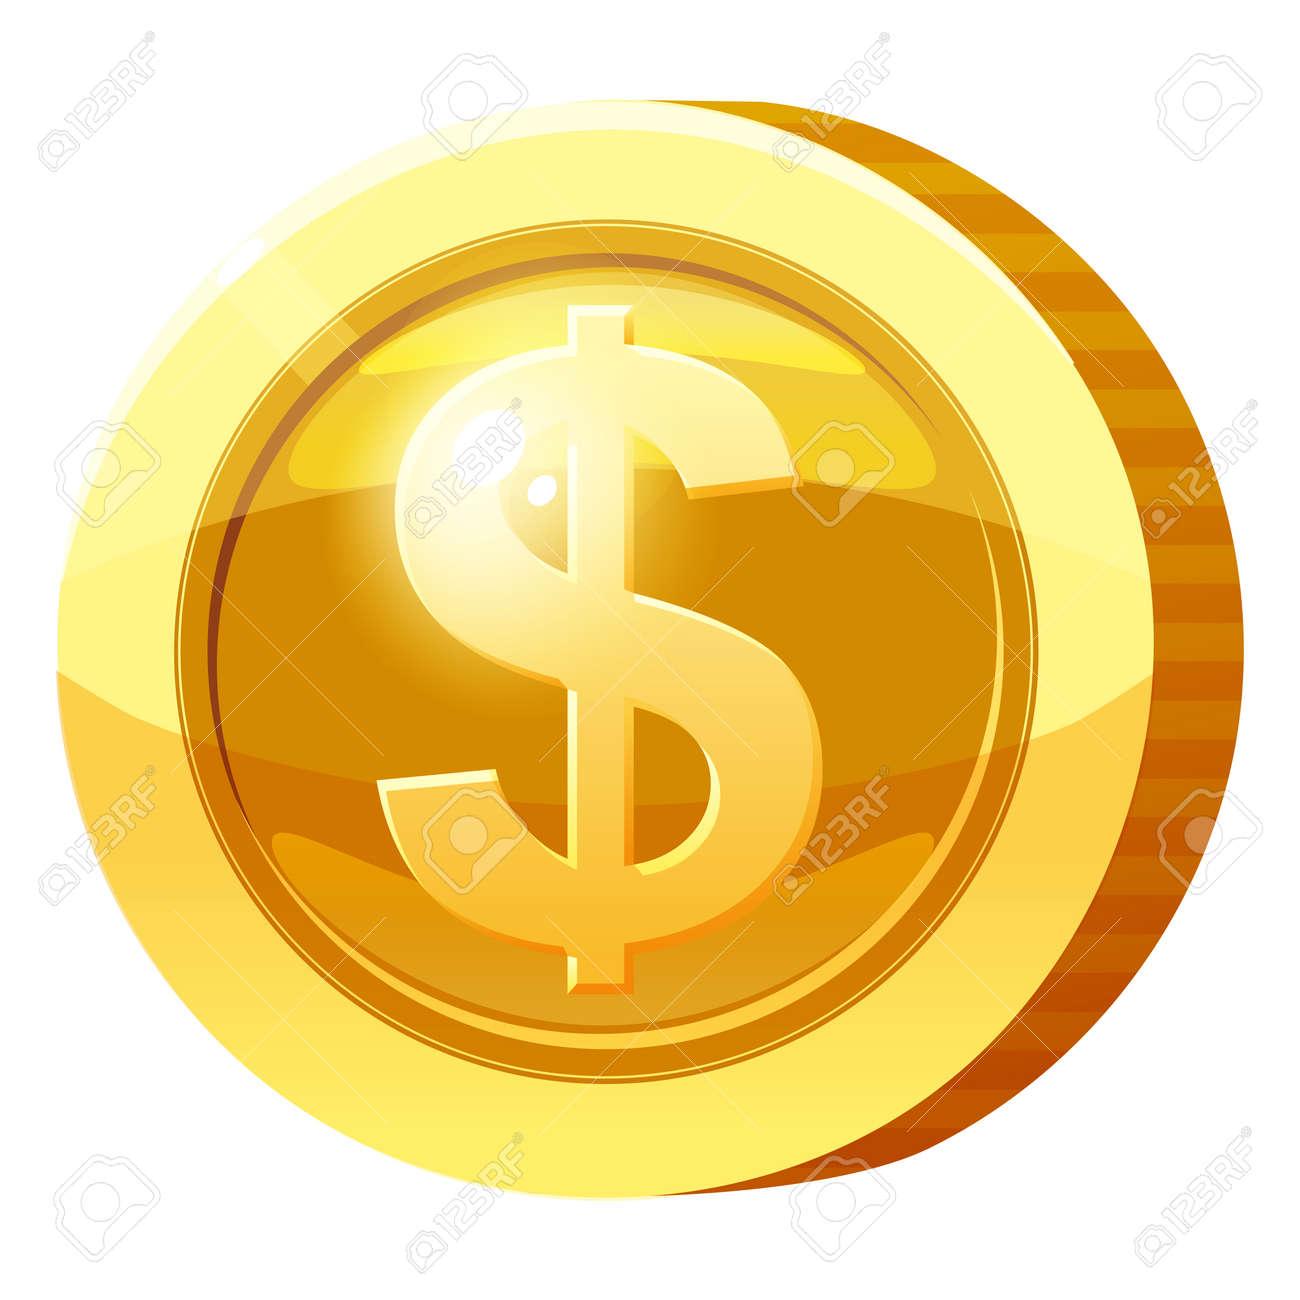 Gold Medal Coin Money symbol. Golden token for games, user interface asset element. Vector illustration - 171629483